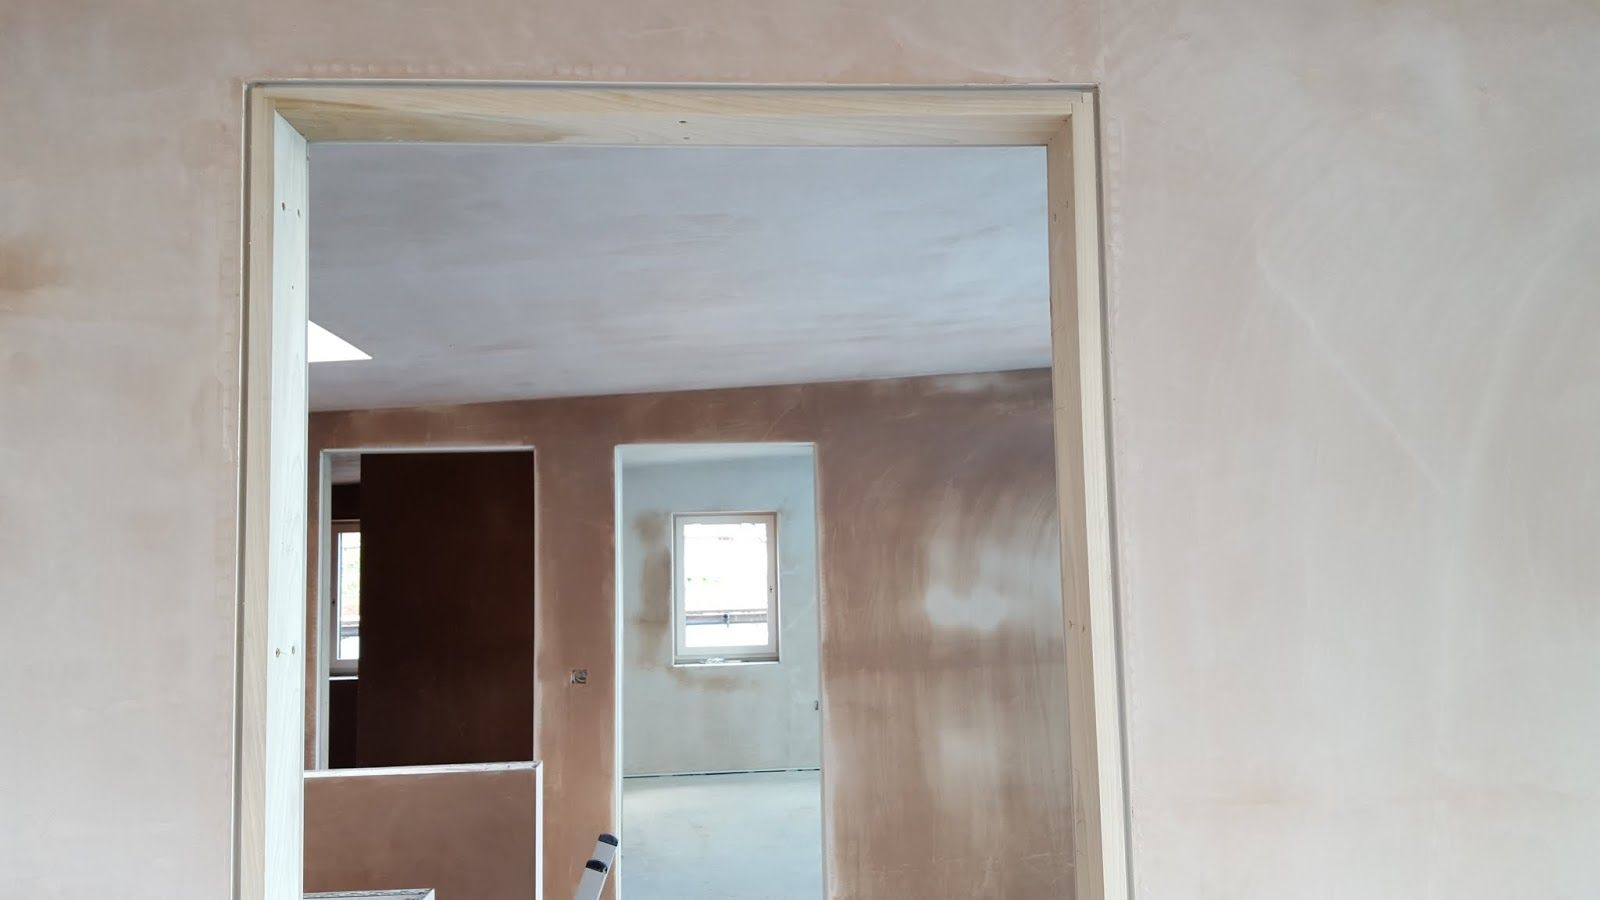 Showing The Shadow Gap Around The Door Frame Look No Horrible